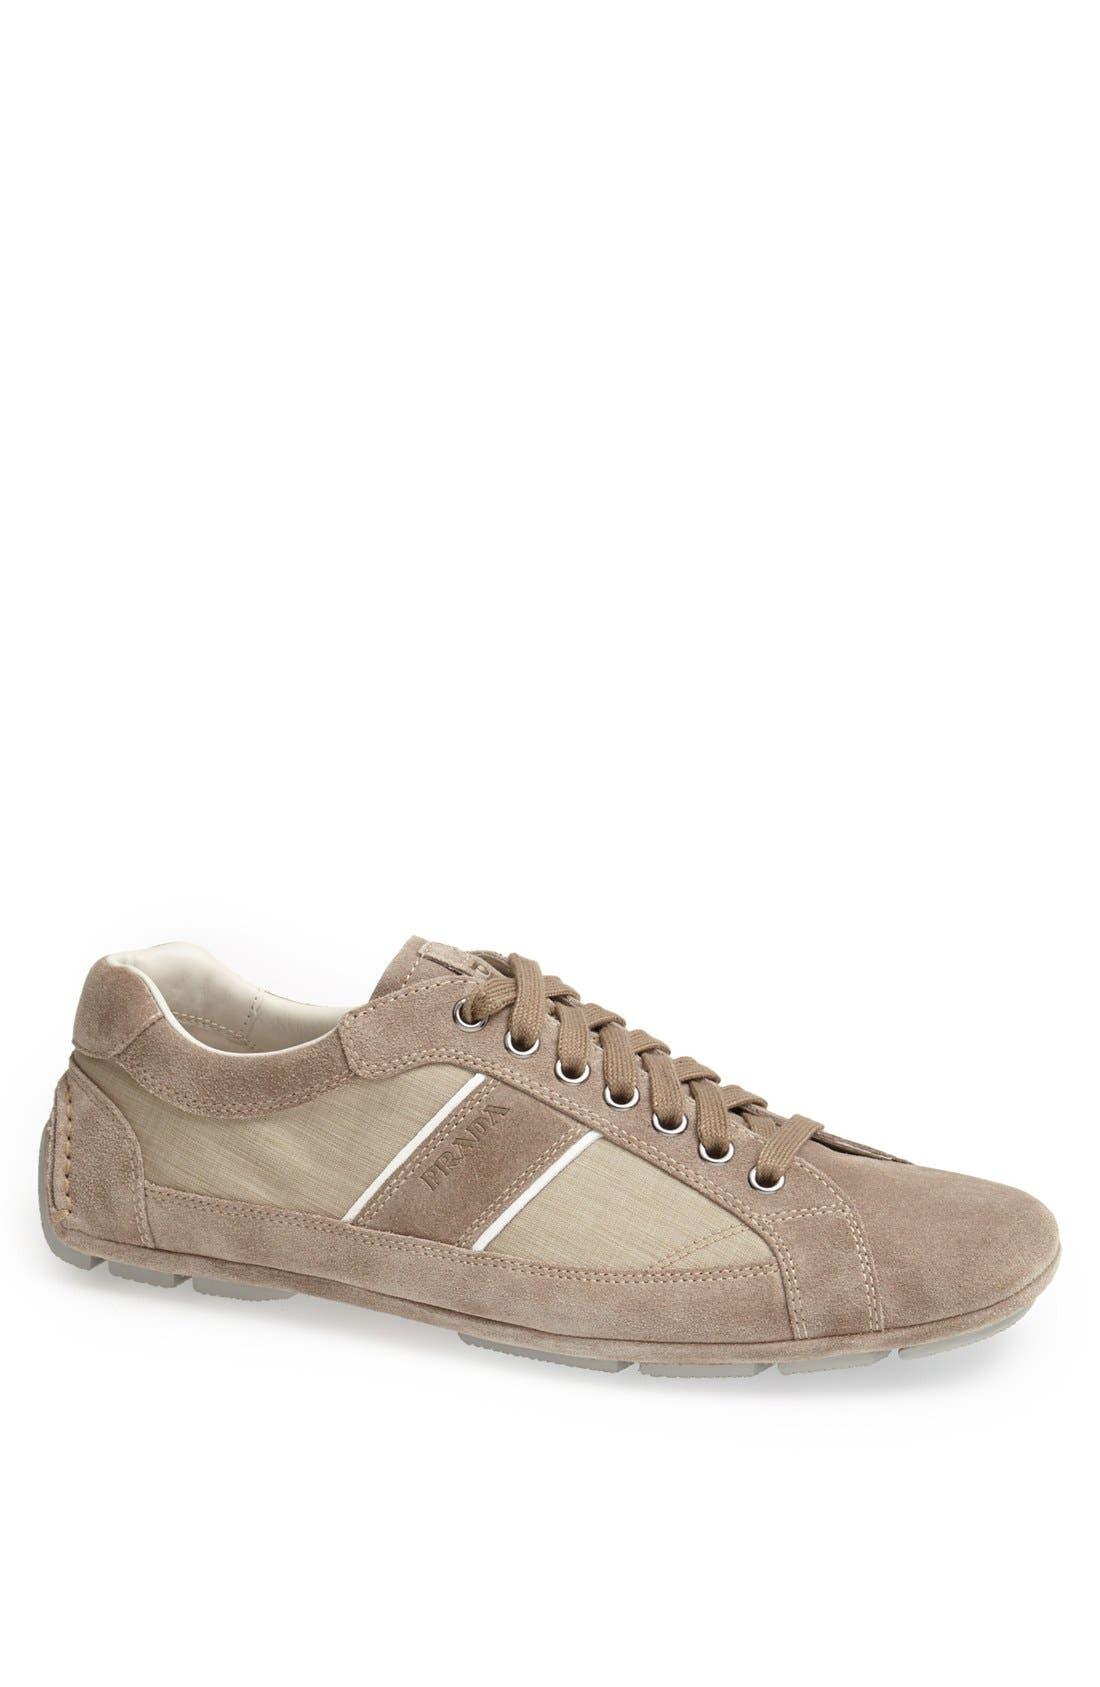 Main Image - Prada Low Profile Suede and Nylon Sneaker